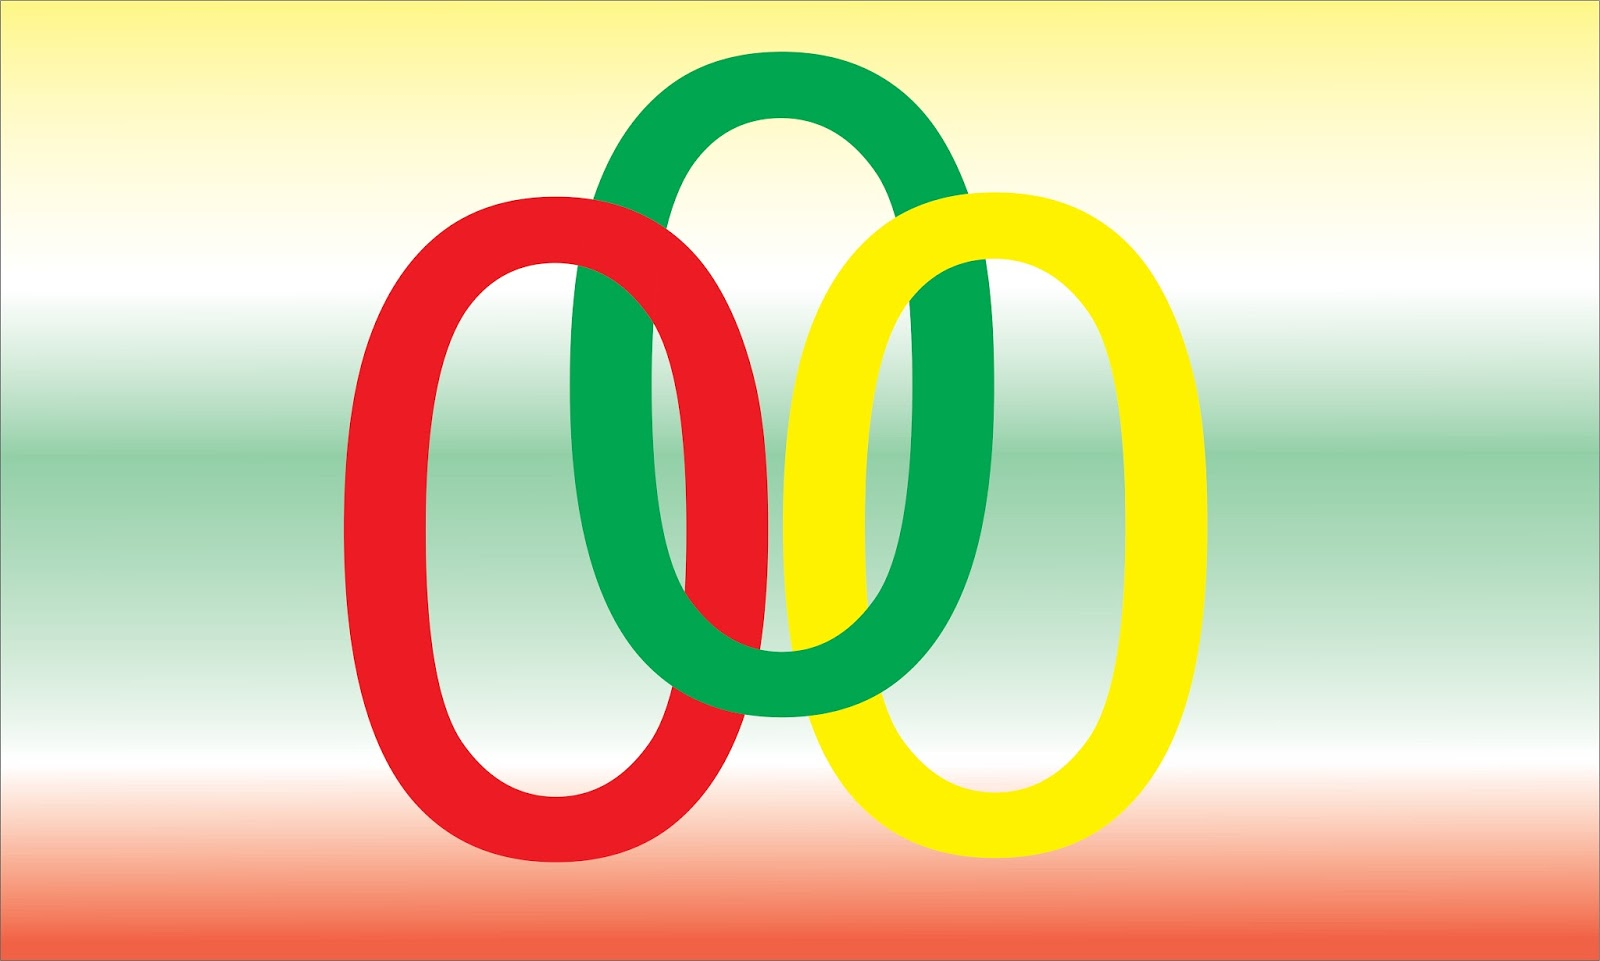 Free CDR Logos for CorelDraw